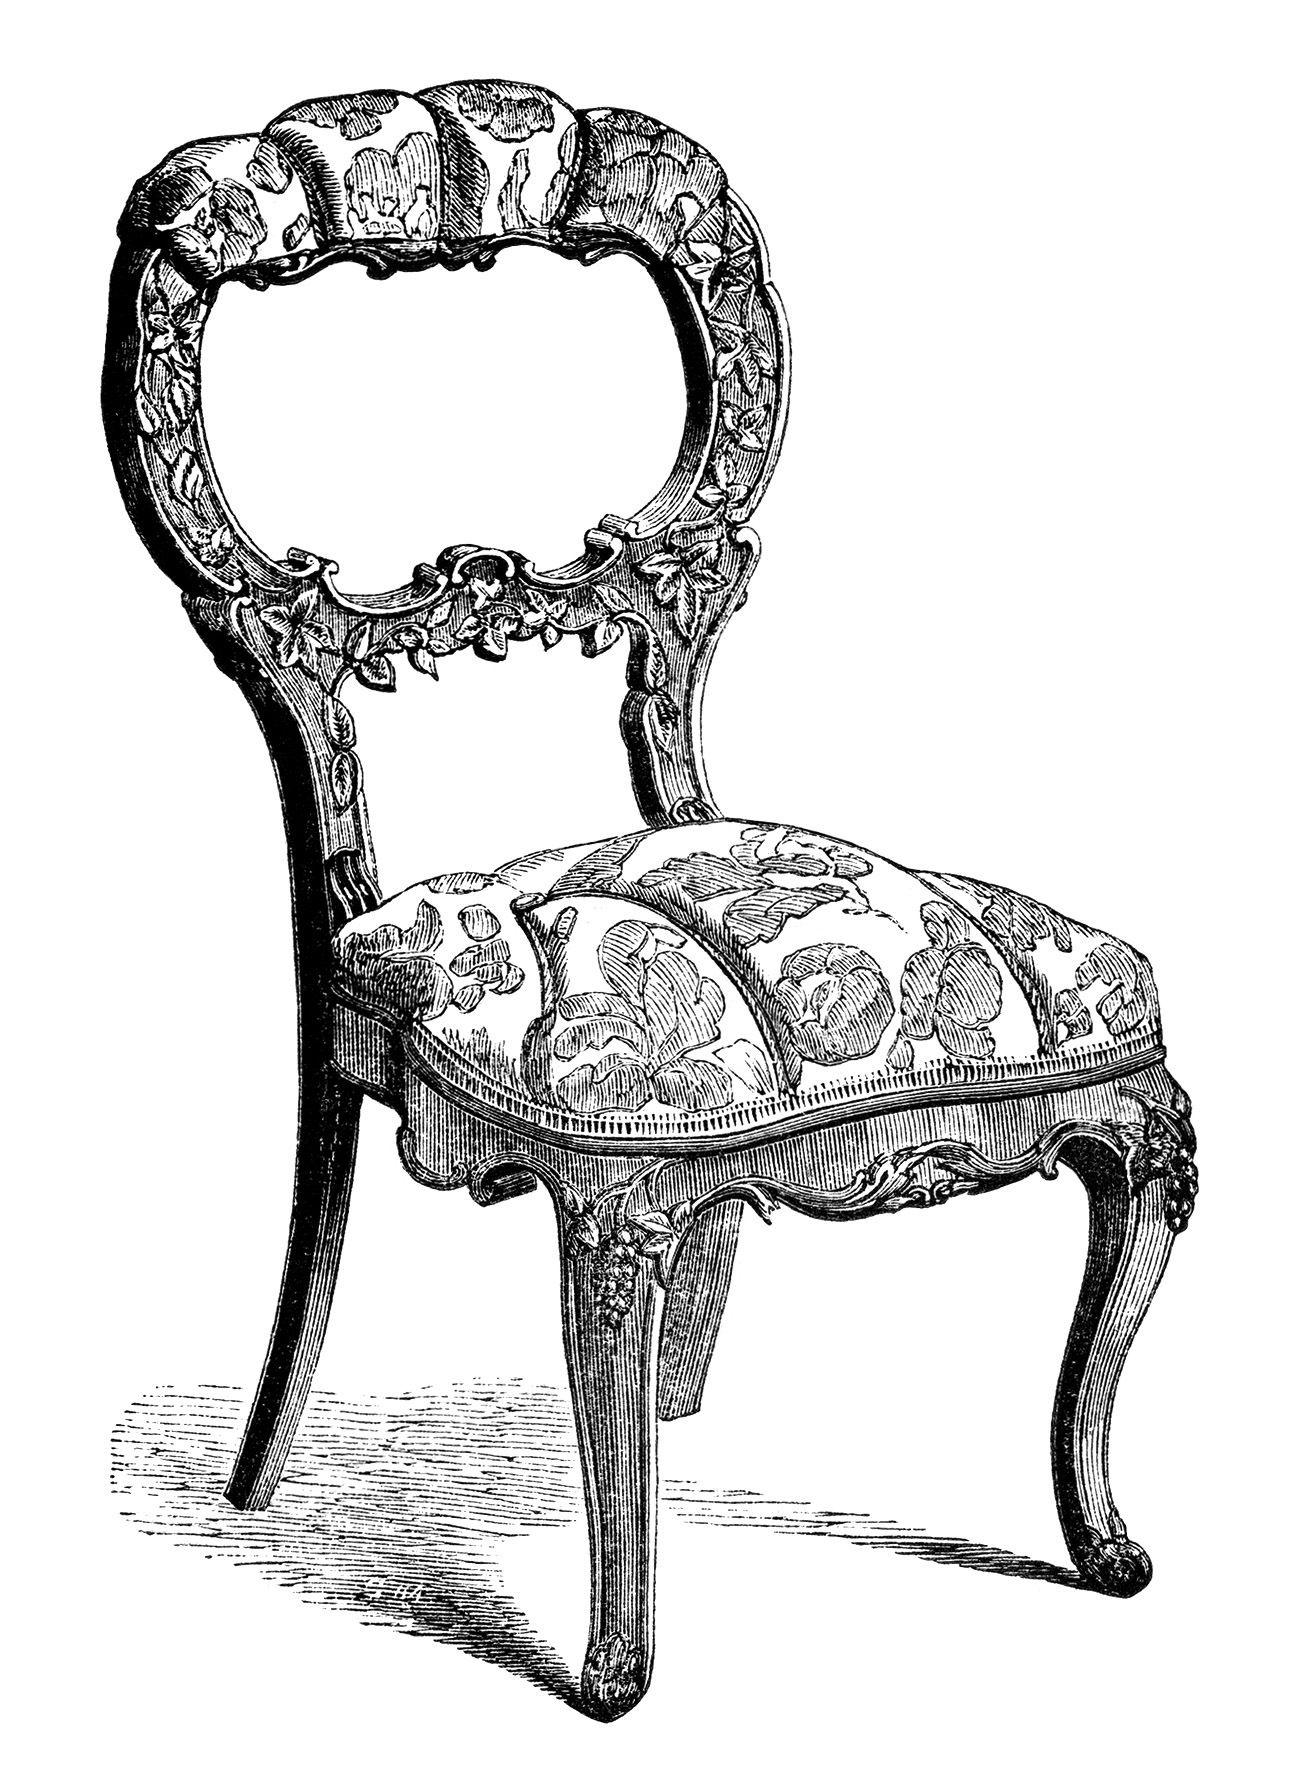 Free Antique Furniture Appraisal - New Antique Furniture Appraisal Fresh –  Witsolut.com - Free - Free Antique Furniture Appraisal Antique Furniture